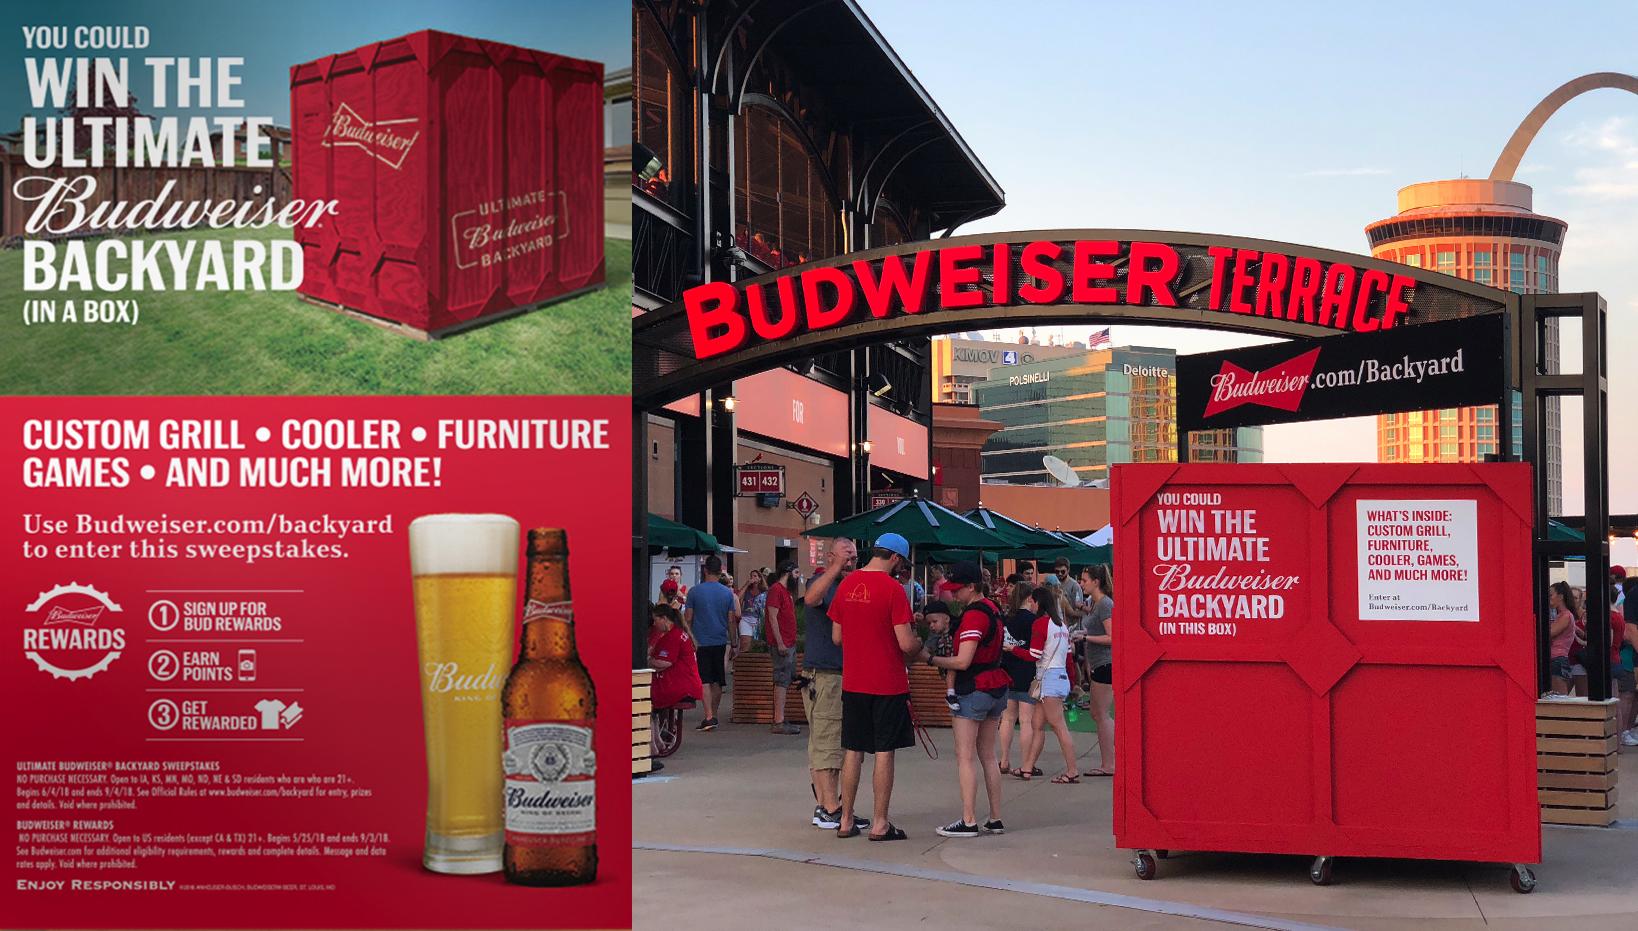 ABInBev Budweiser Backyard – Shopper Marketing, Sweepstakes, Rewards Program